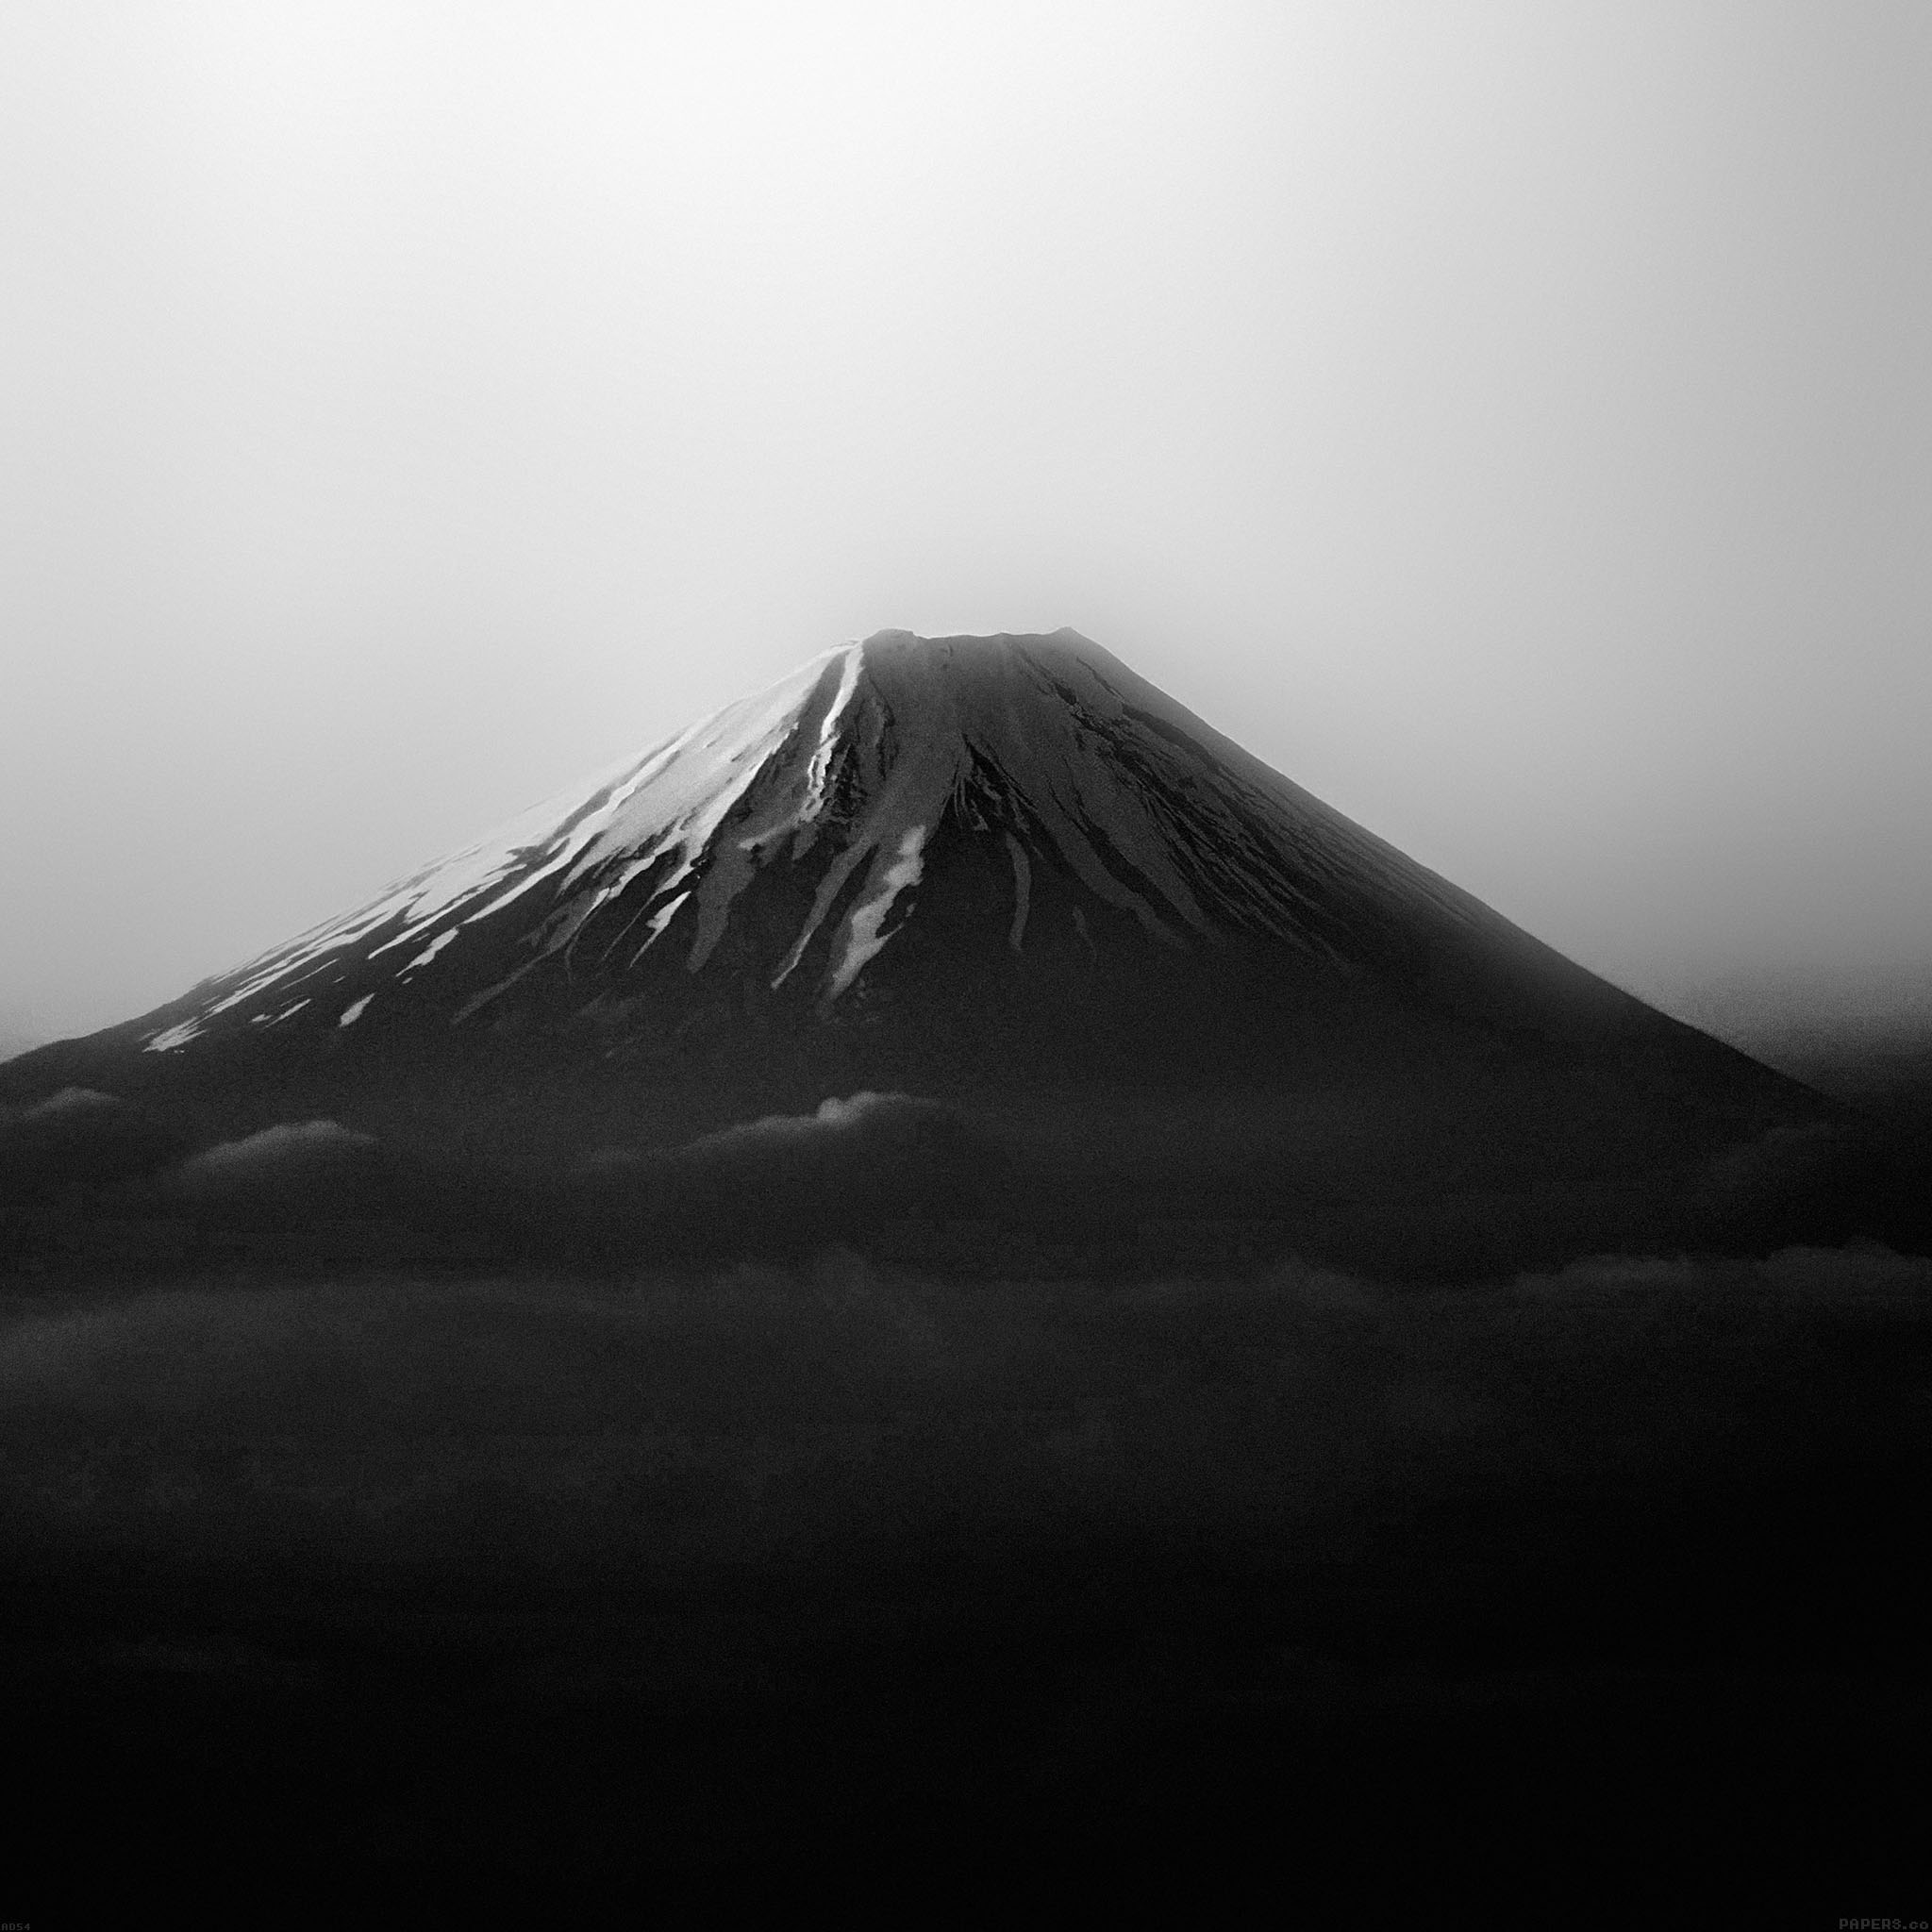 Cell Wallpaper Hd Illustration Fall Freeios7 Ad54 Fuji Dark Mountain Alone Parallax Hd